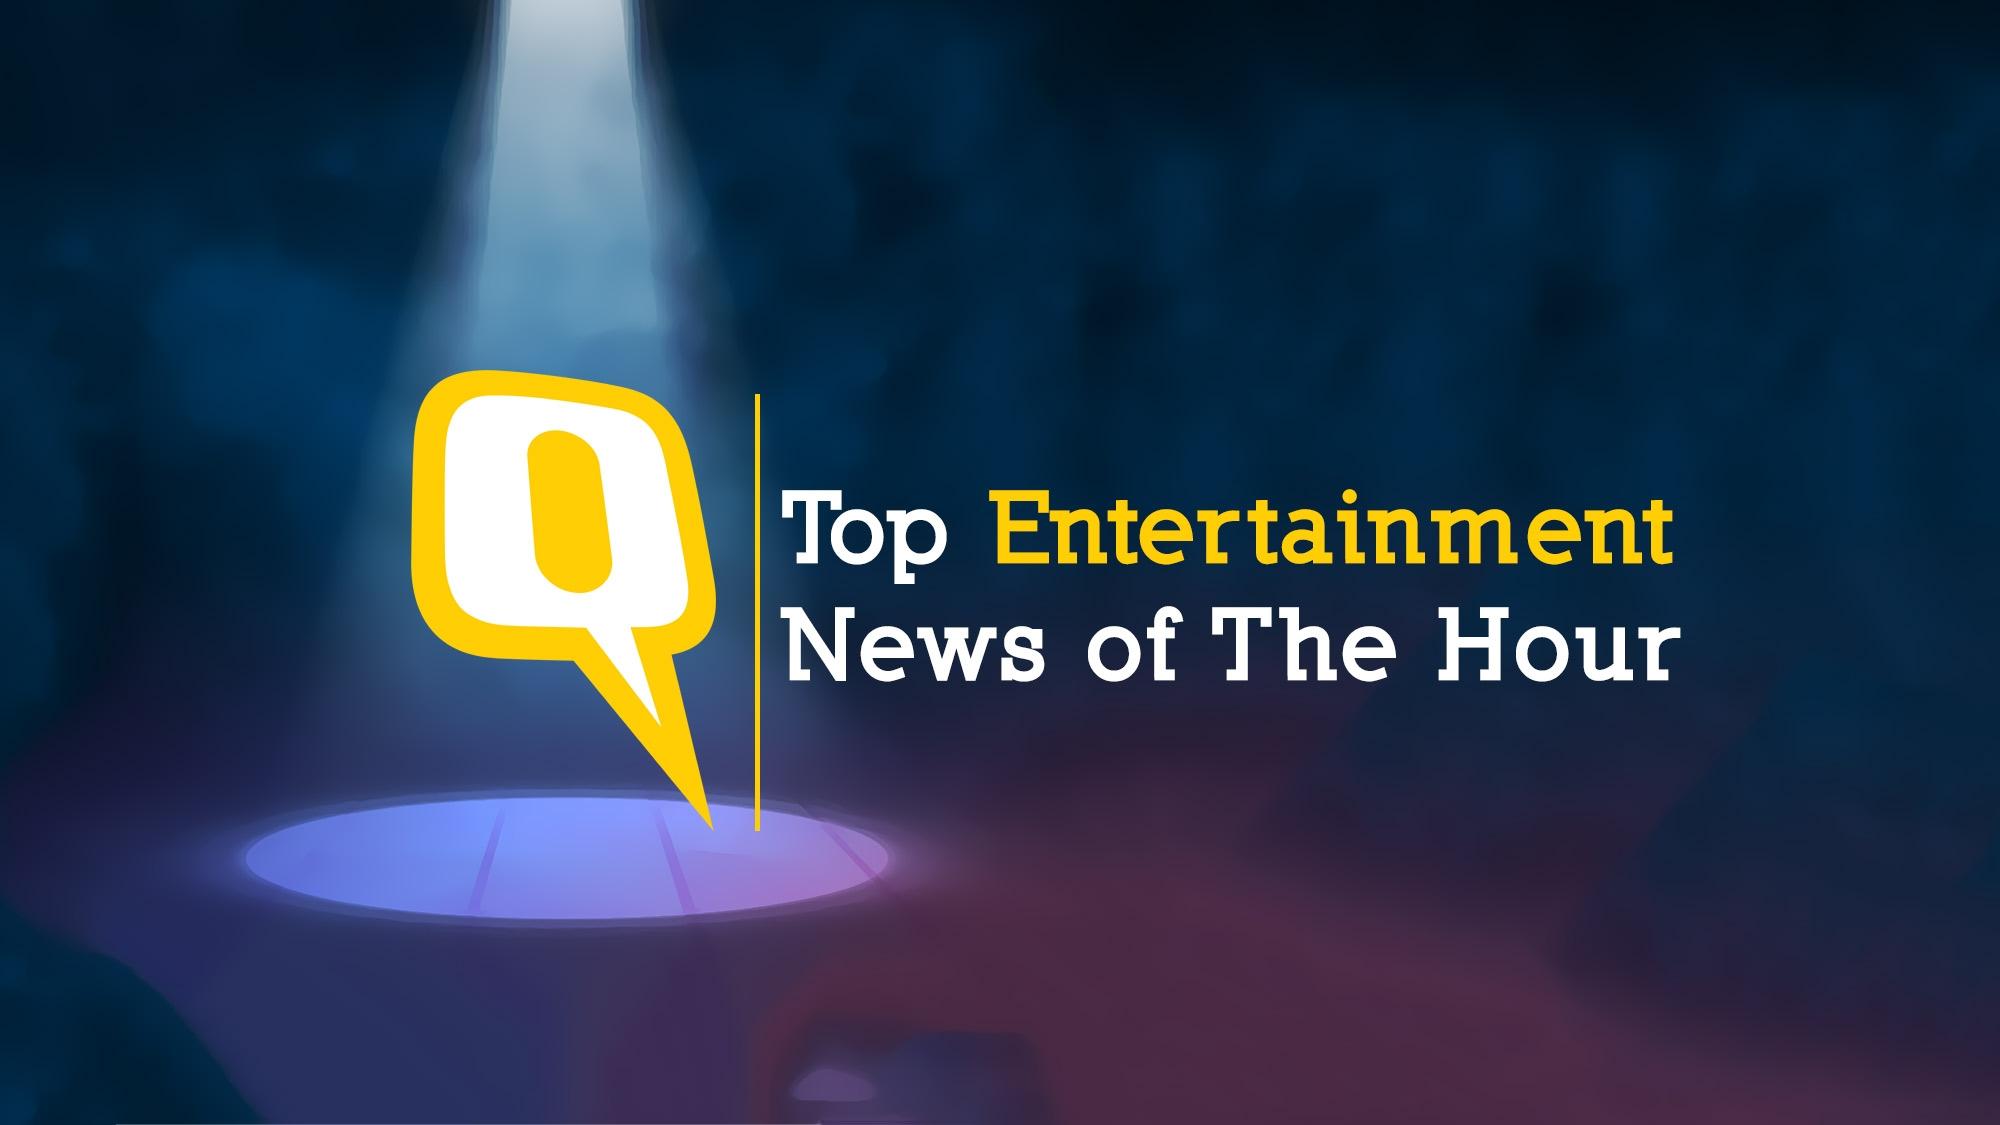 Top Entertainment News: Priyanka Chopra Cheers For Nick Jonas